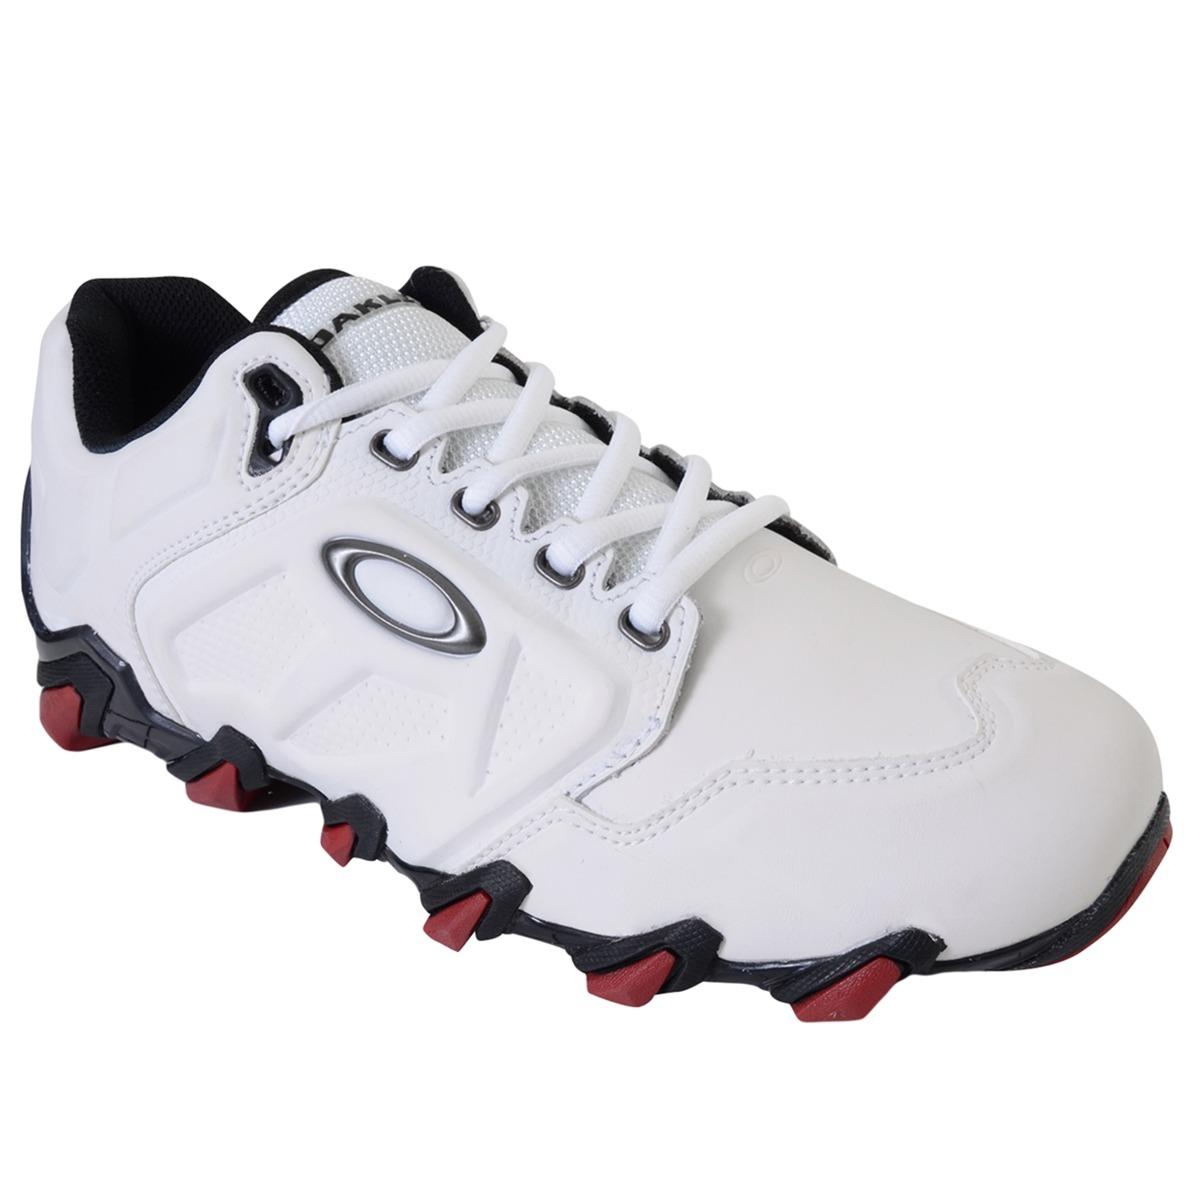 7ec3d331cfa tênis masculino oakley teeth 4 branco vermelho. Carregando zoom.